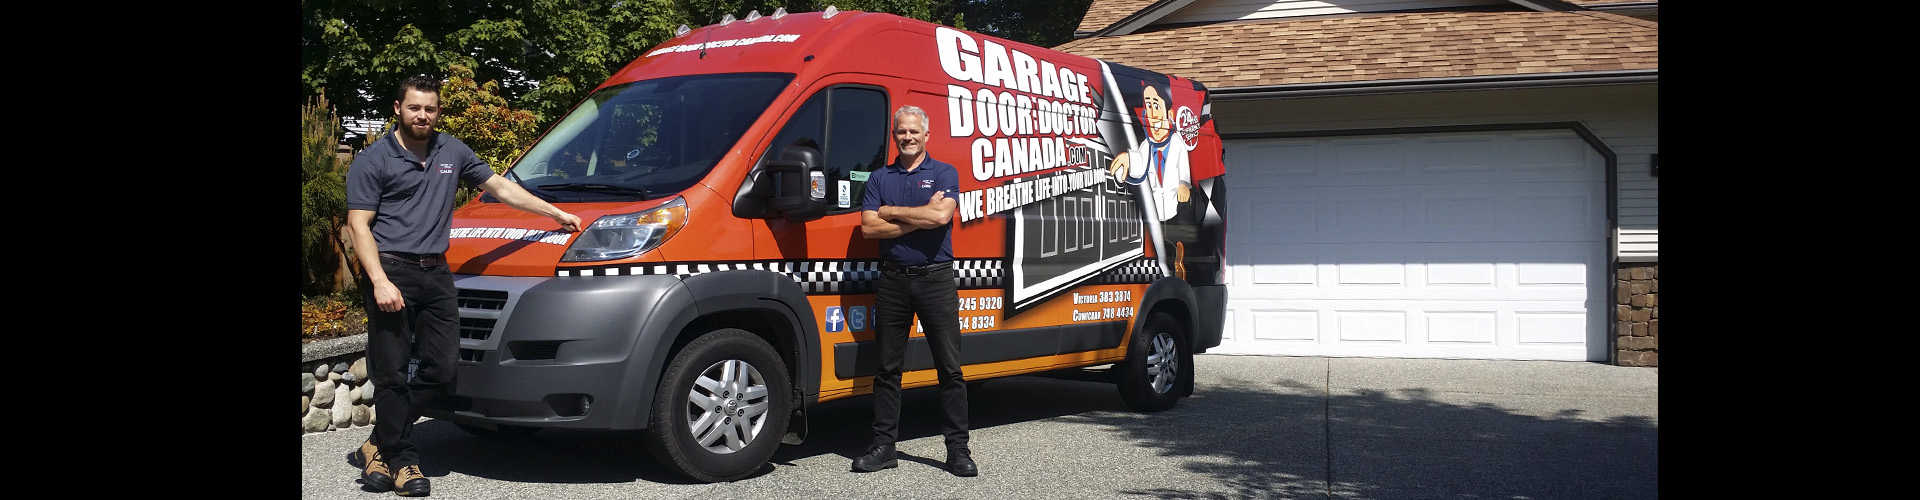 Garage Door Doctor Canada Repairs Openers Springs